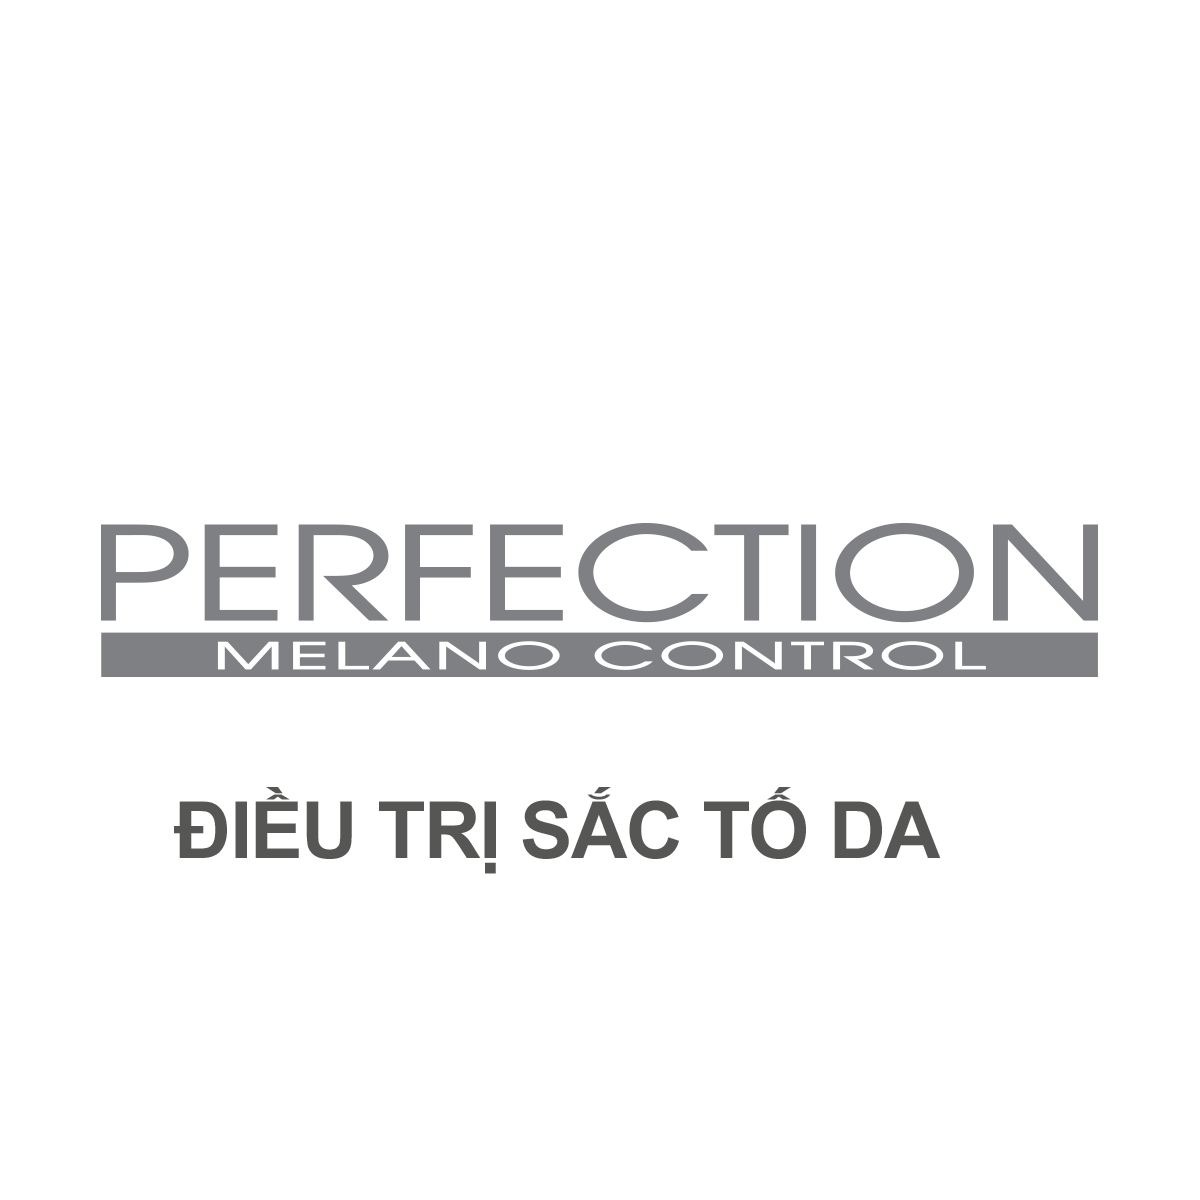 PERFECTION MELANO CONTROL